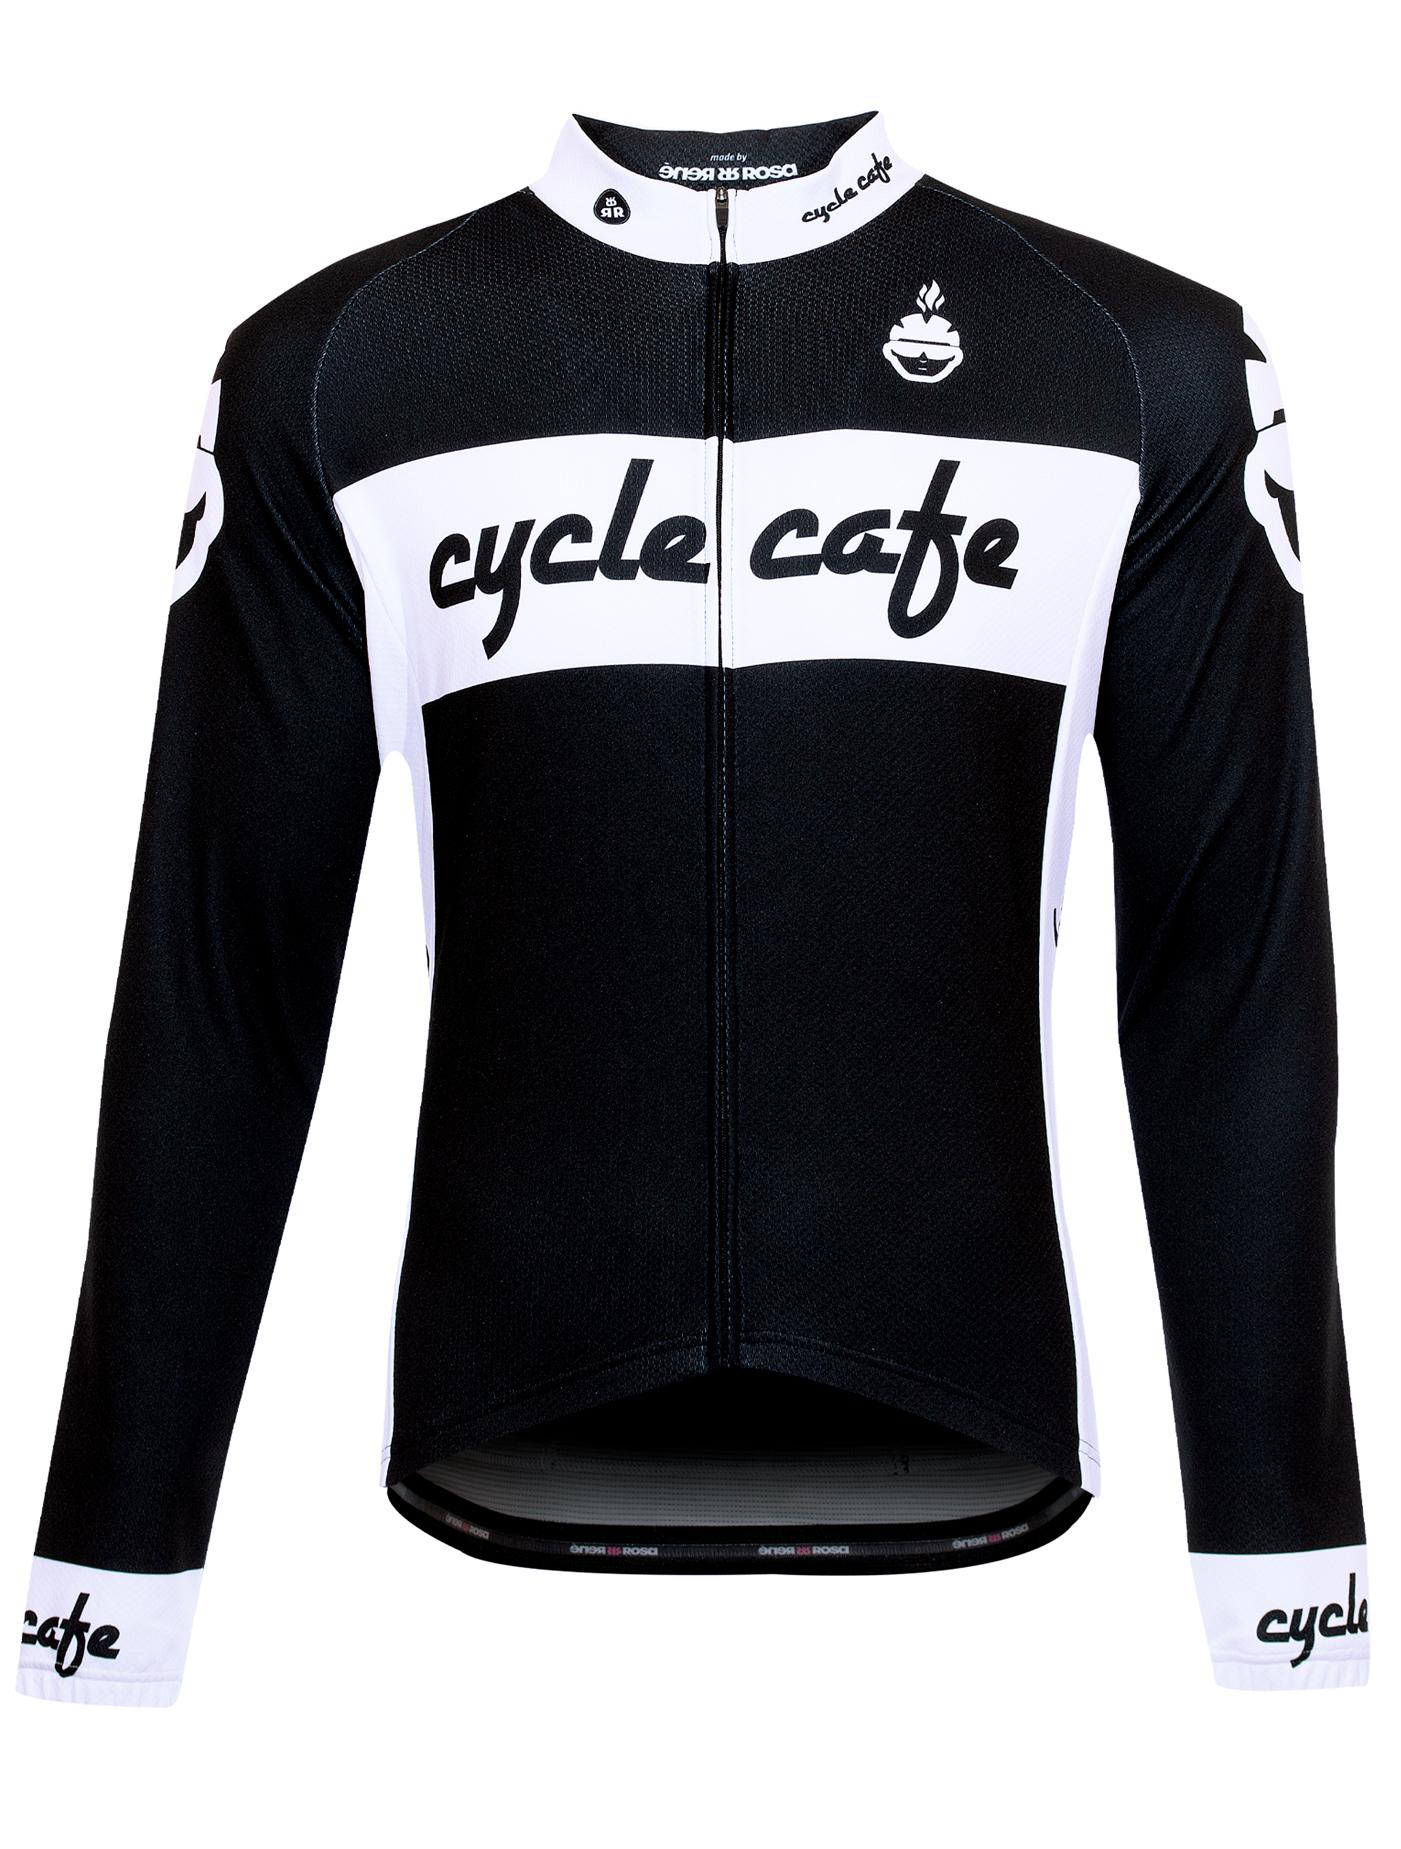 Trikotjacke RRT070M / CycleCafe Classic Line